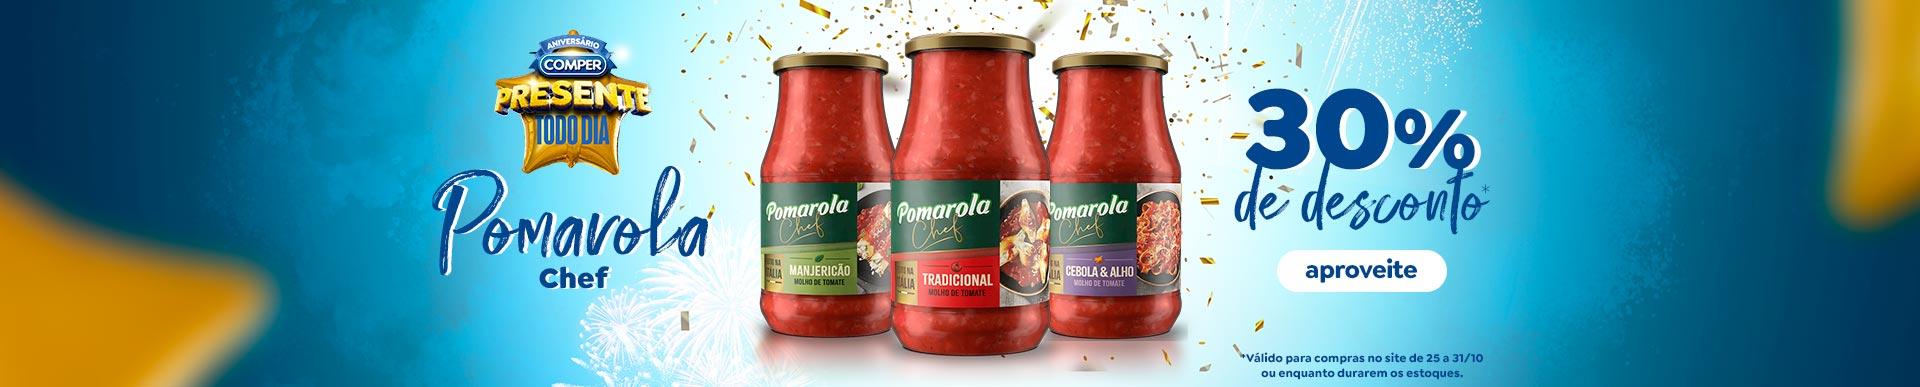 amkt_2021-10-25a10-31_aniversario-presentetododia_cargill_MS-pomarola-chef-30off